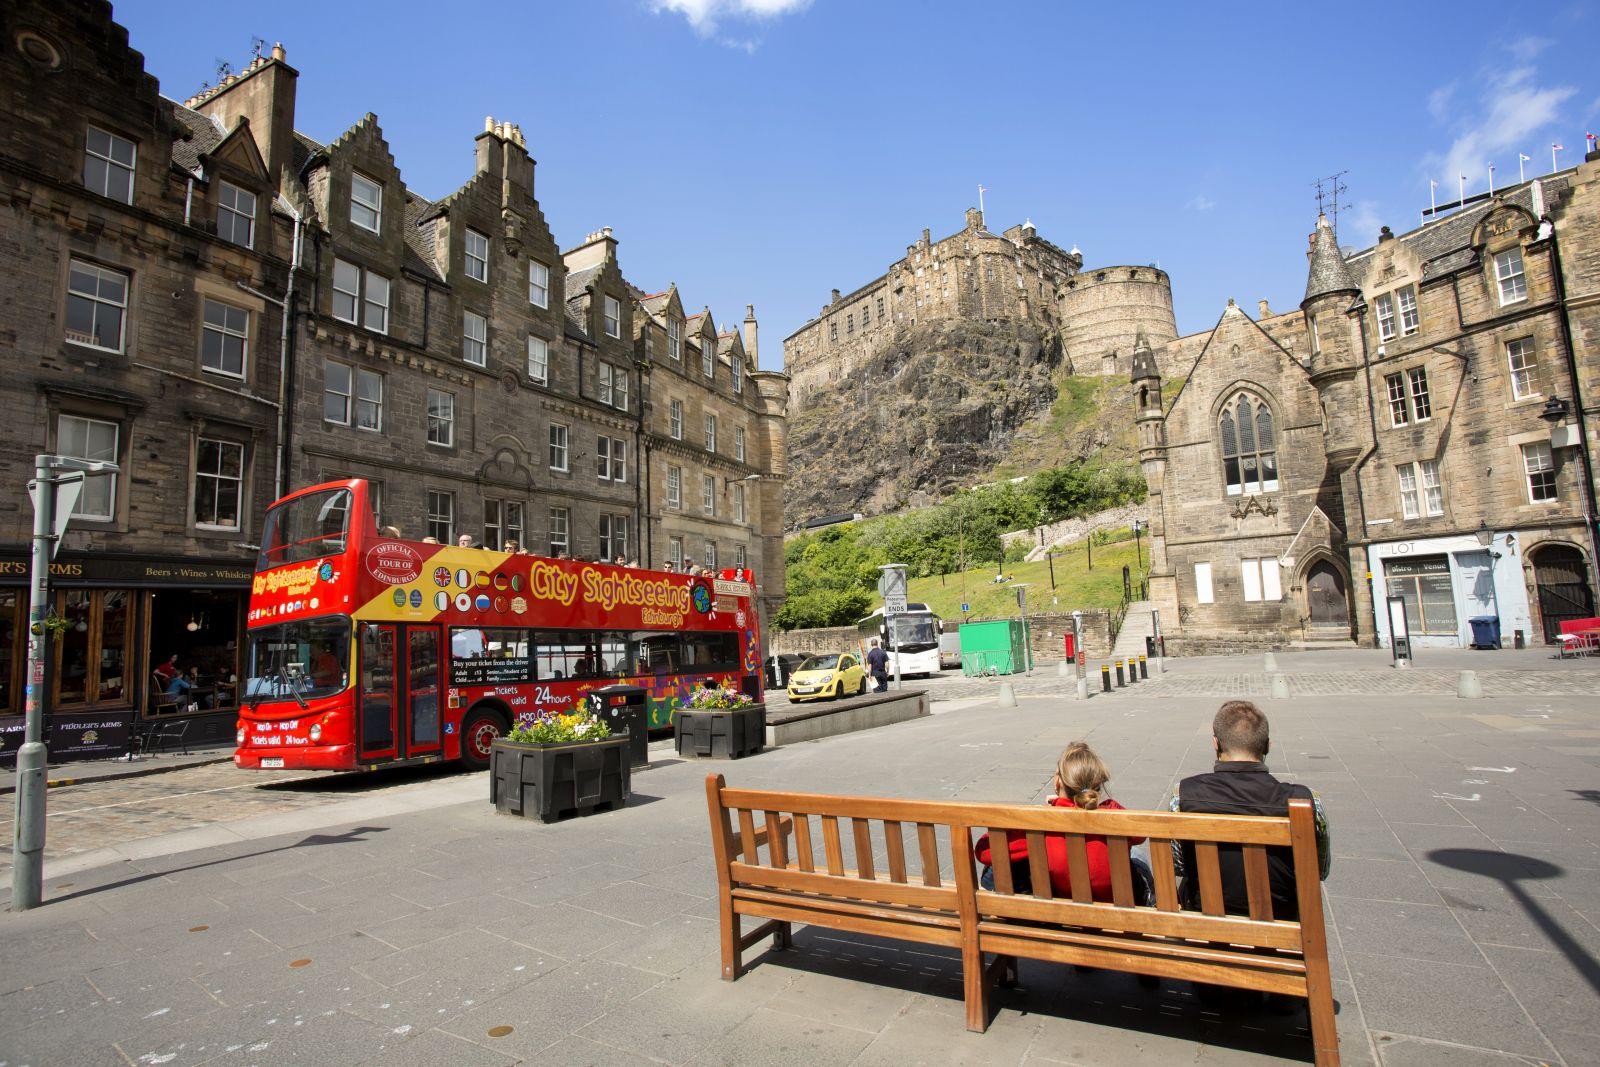 Exploring Edinburgh's city centre on foot